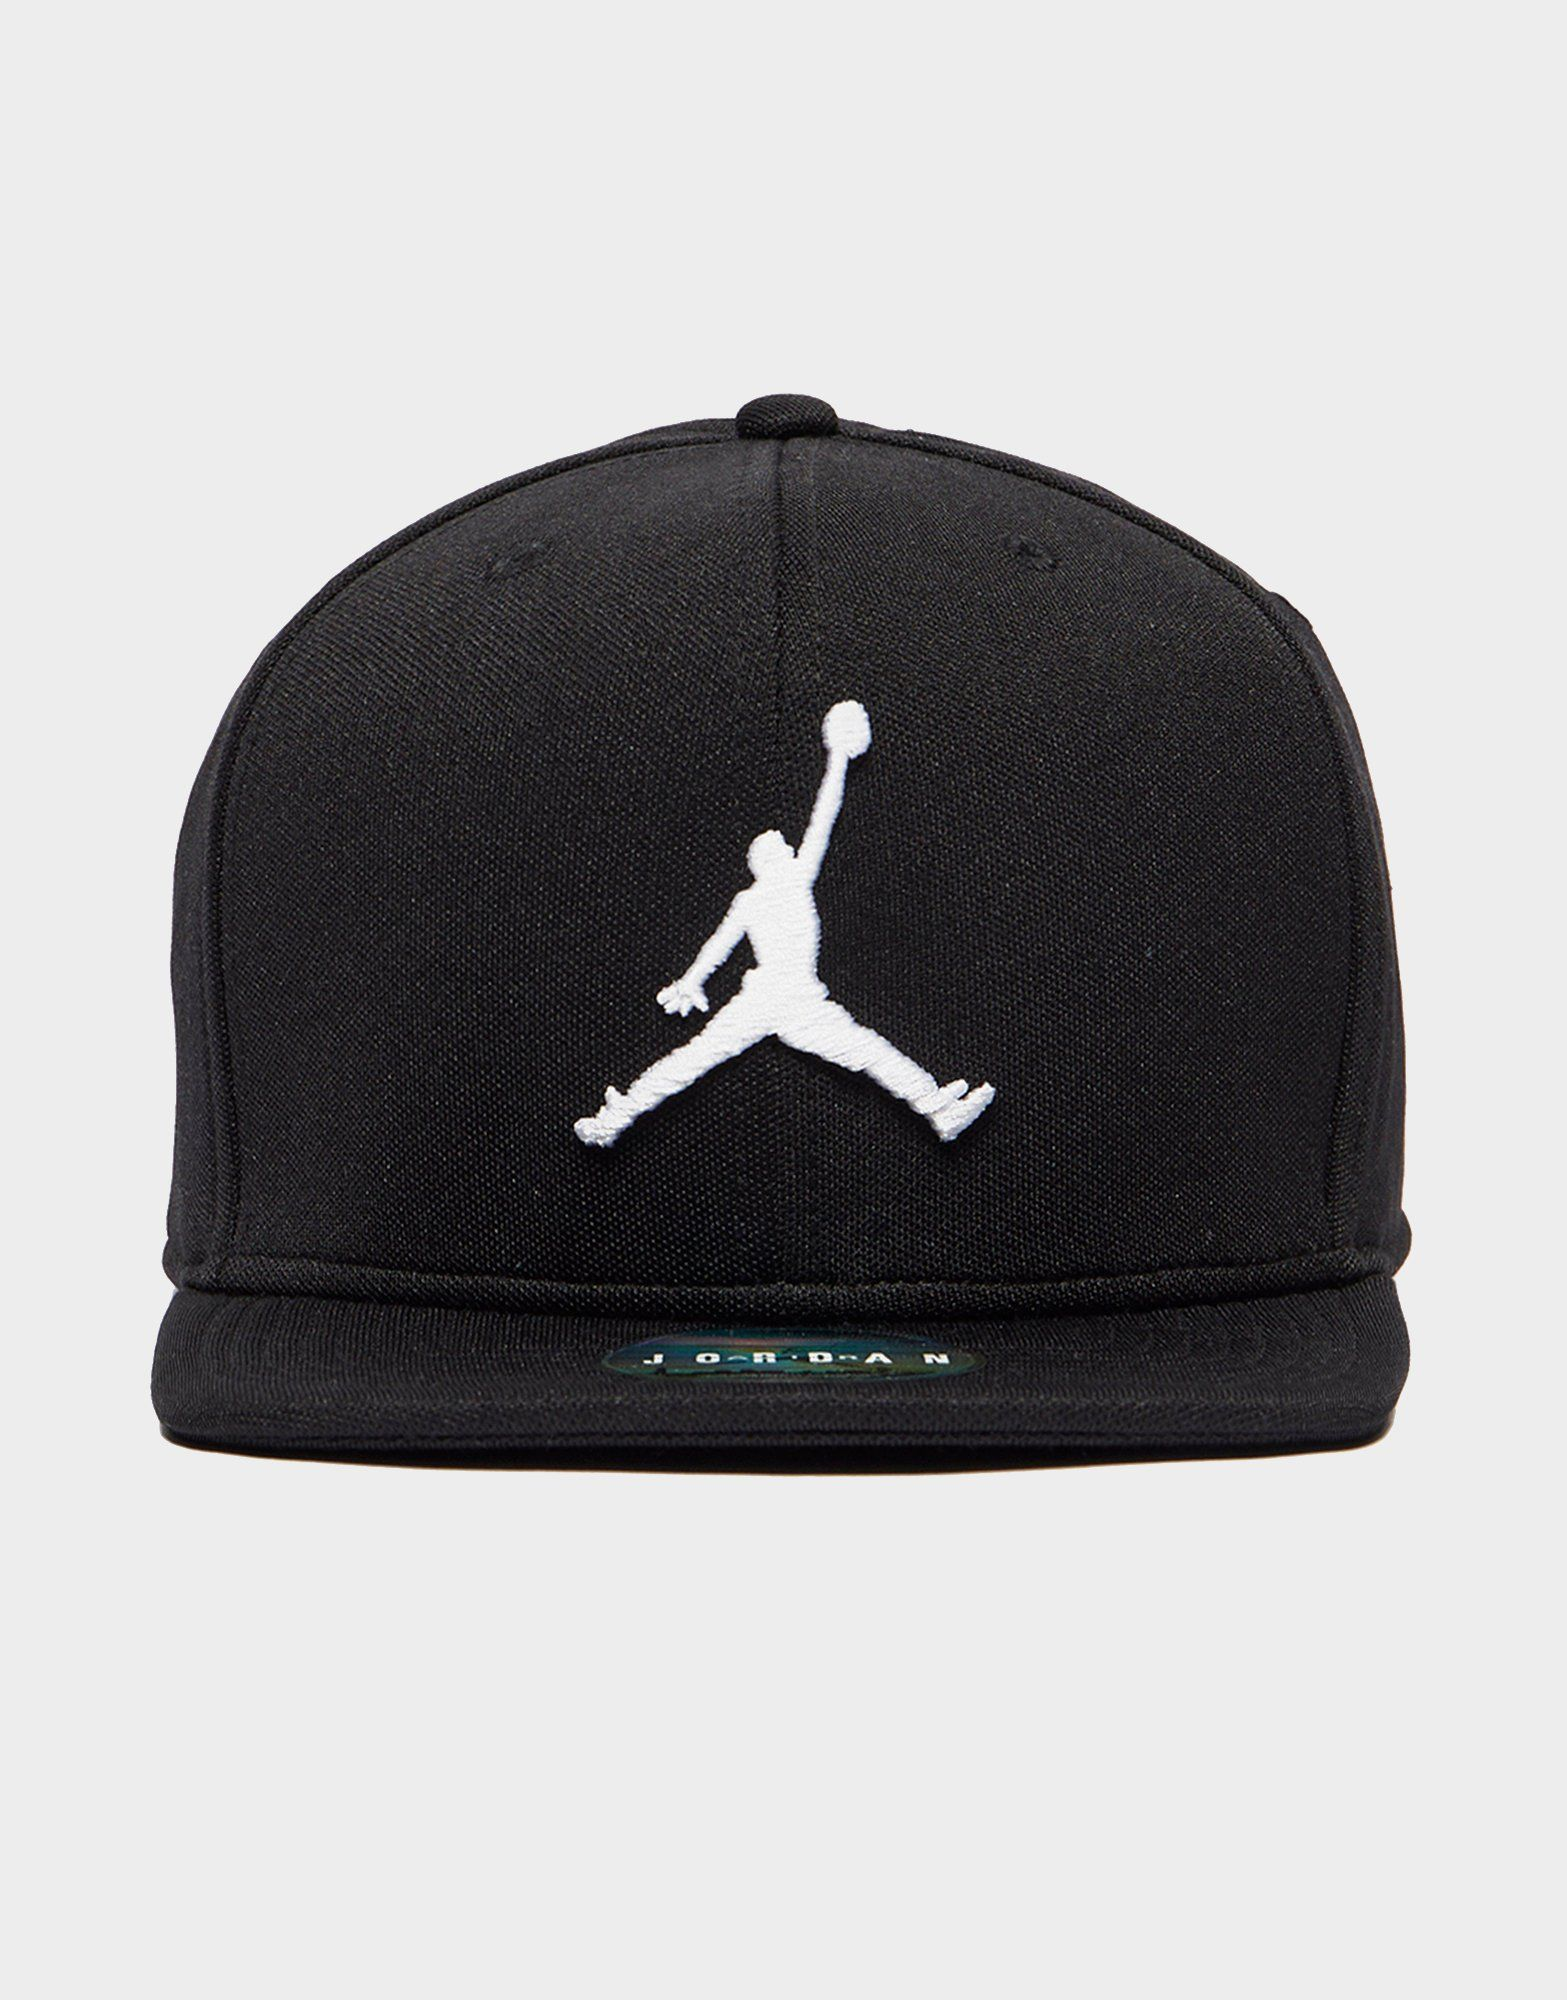 84835a4f0b5 Jordan Jumpman Snapback Cap